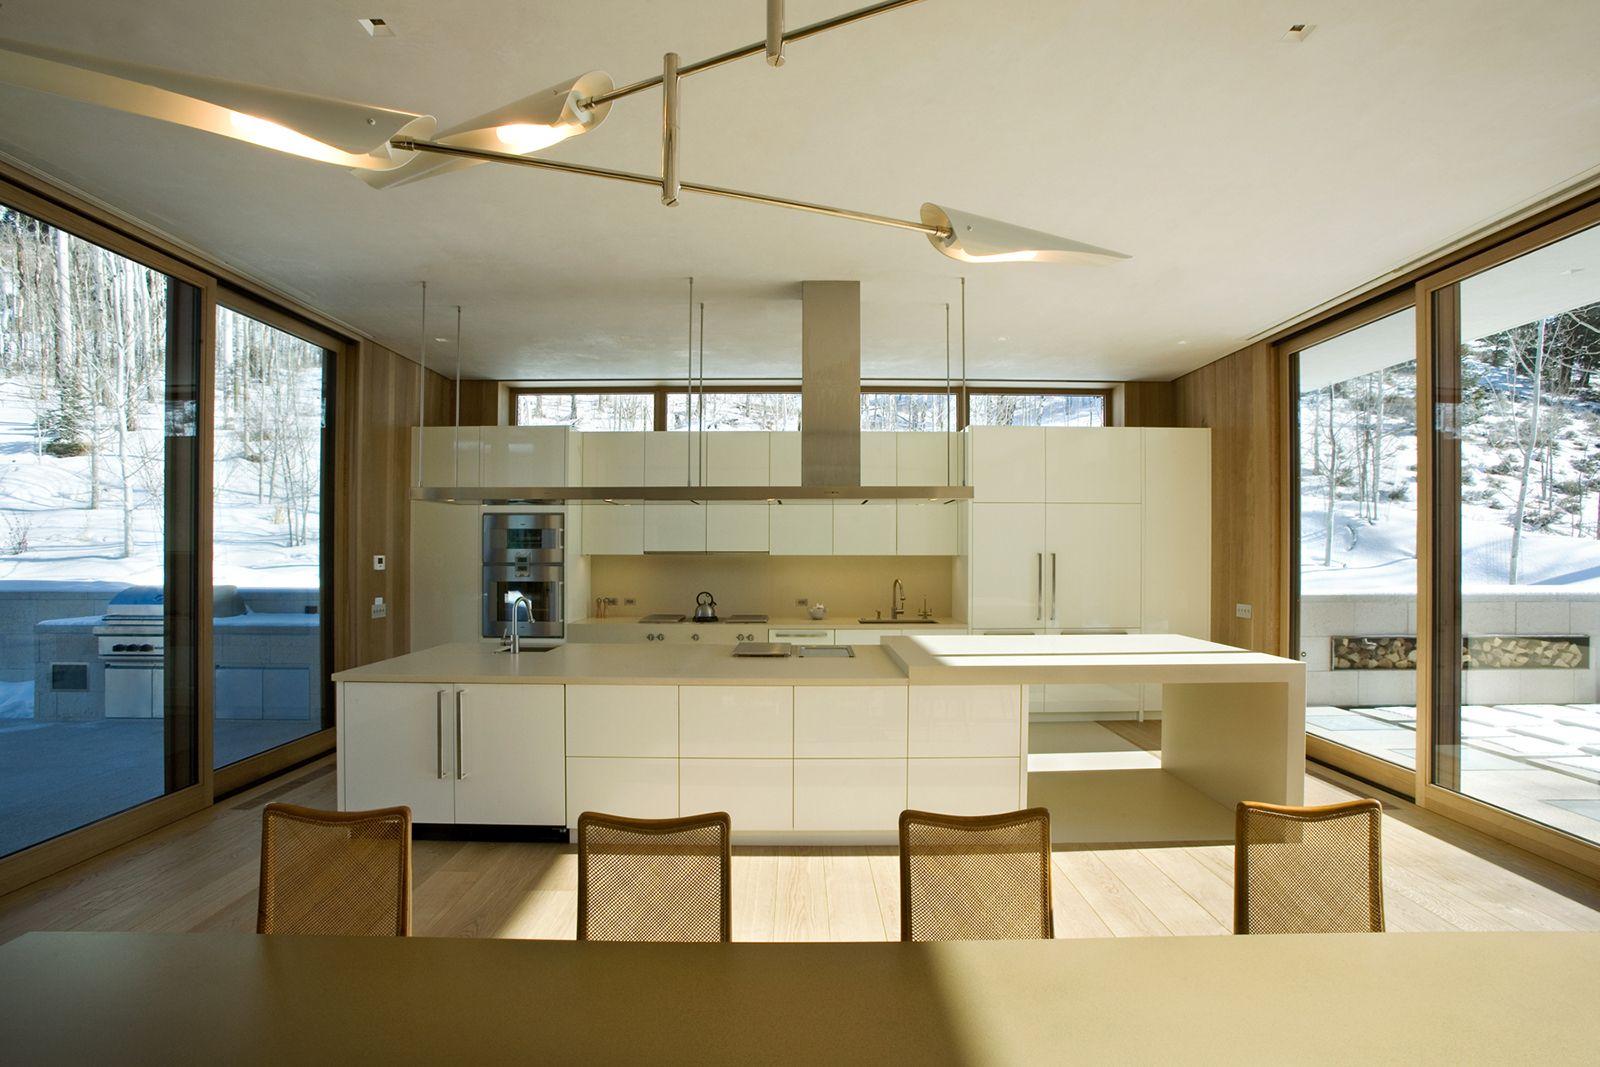 525f5cb8e8e44e988d000064_linear-house-studio-b-architects_drcl_22.jpg (1600×1067)